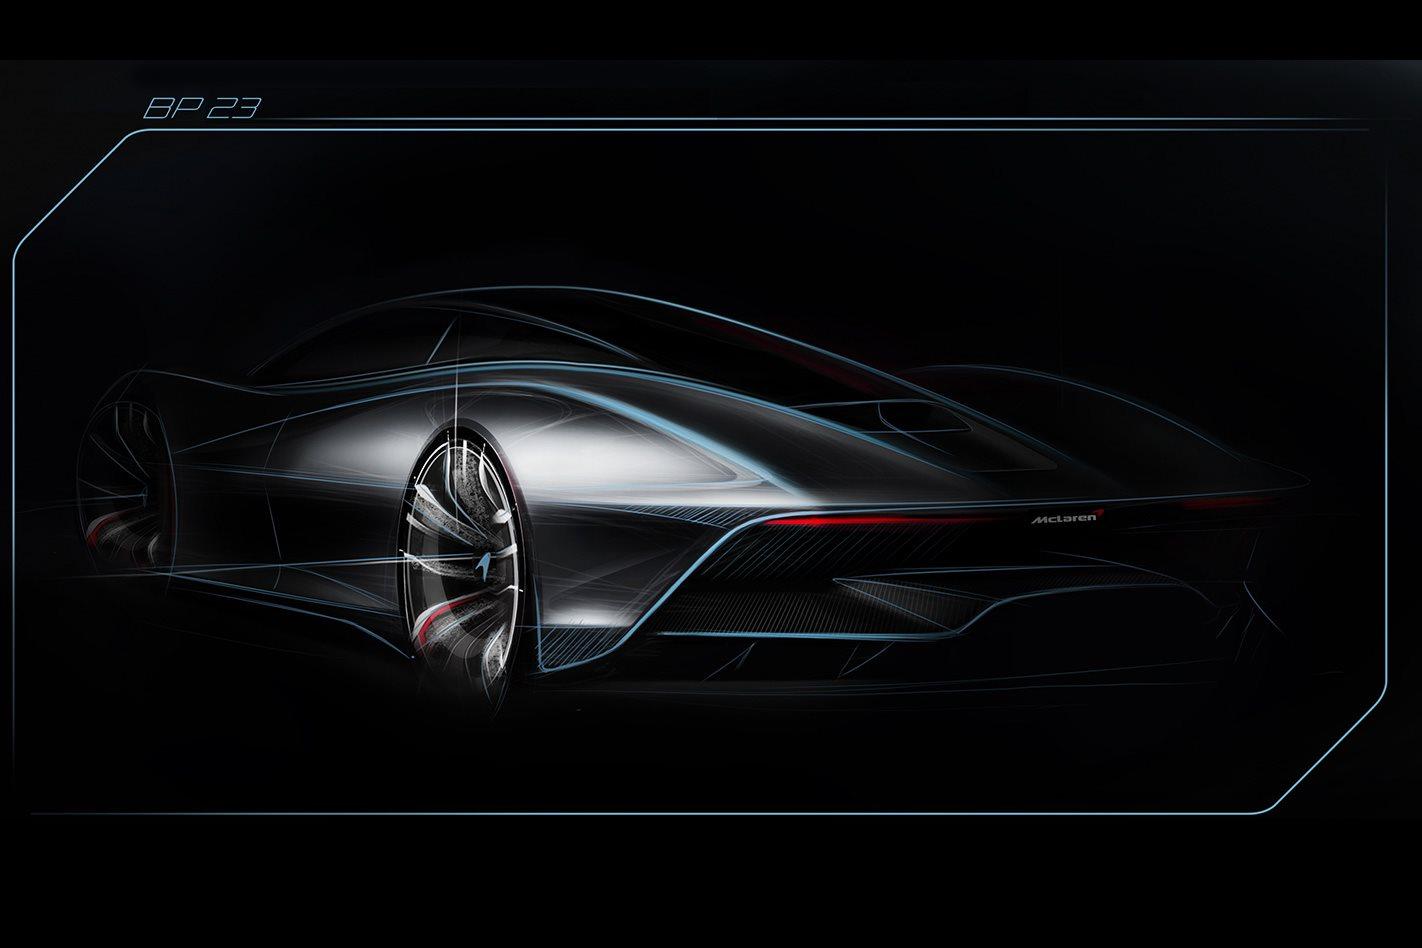 McLaren-BP23-test-mule-designs.jpg